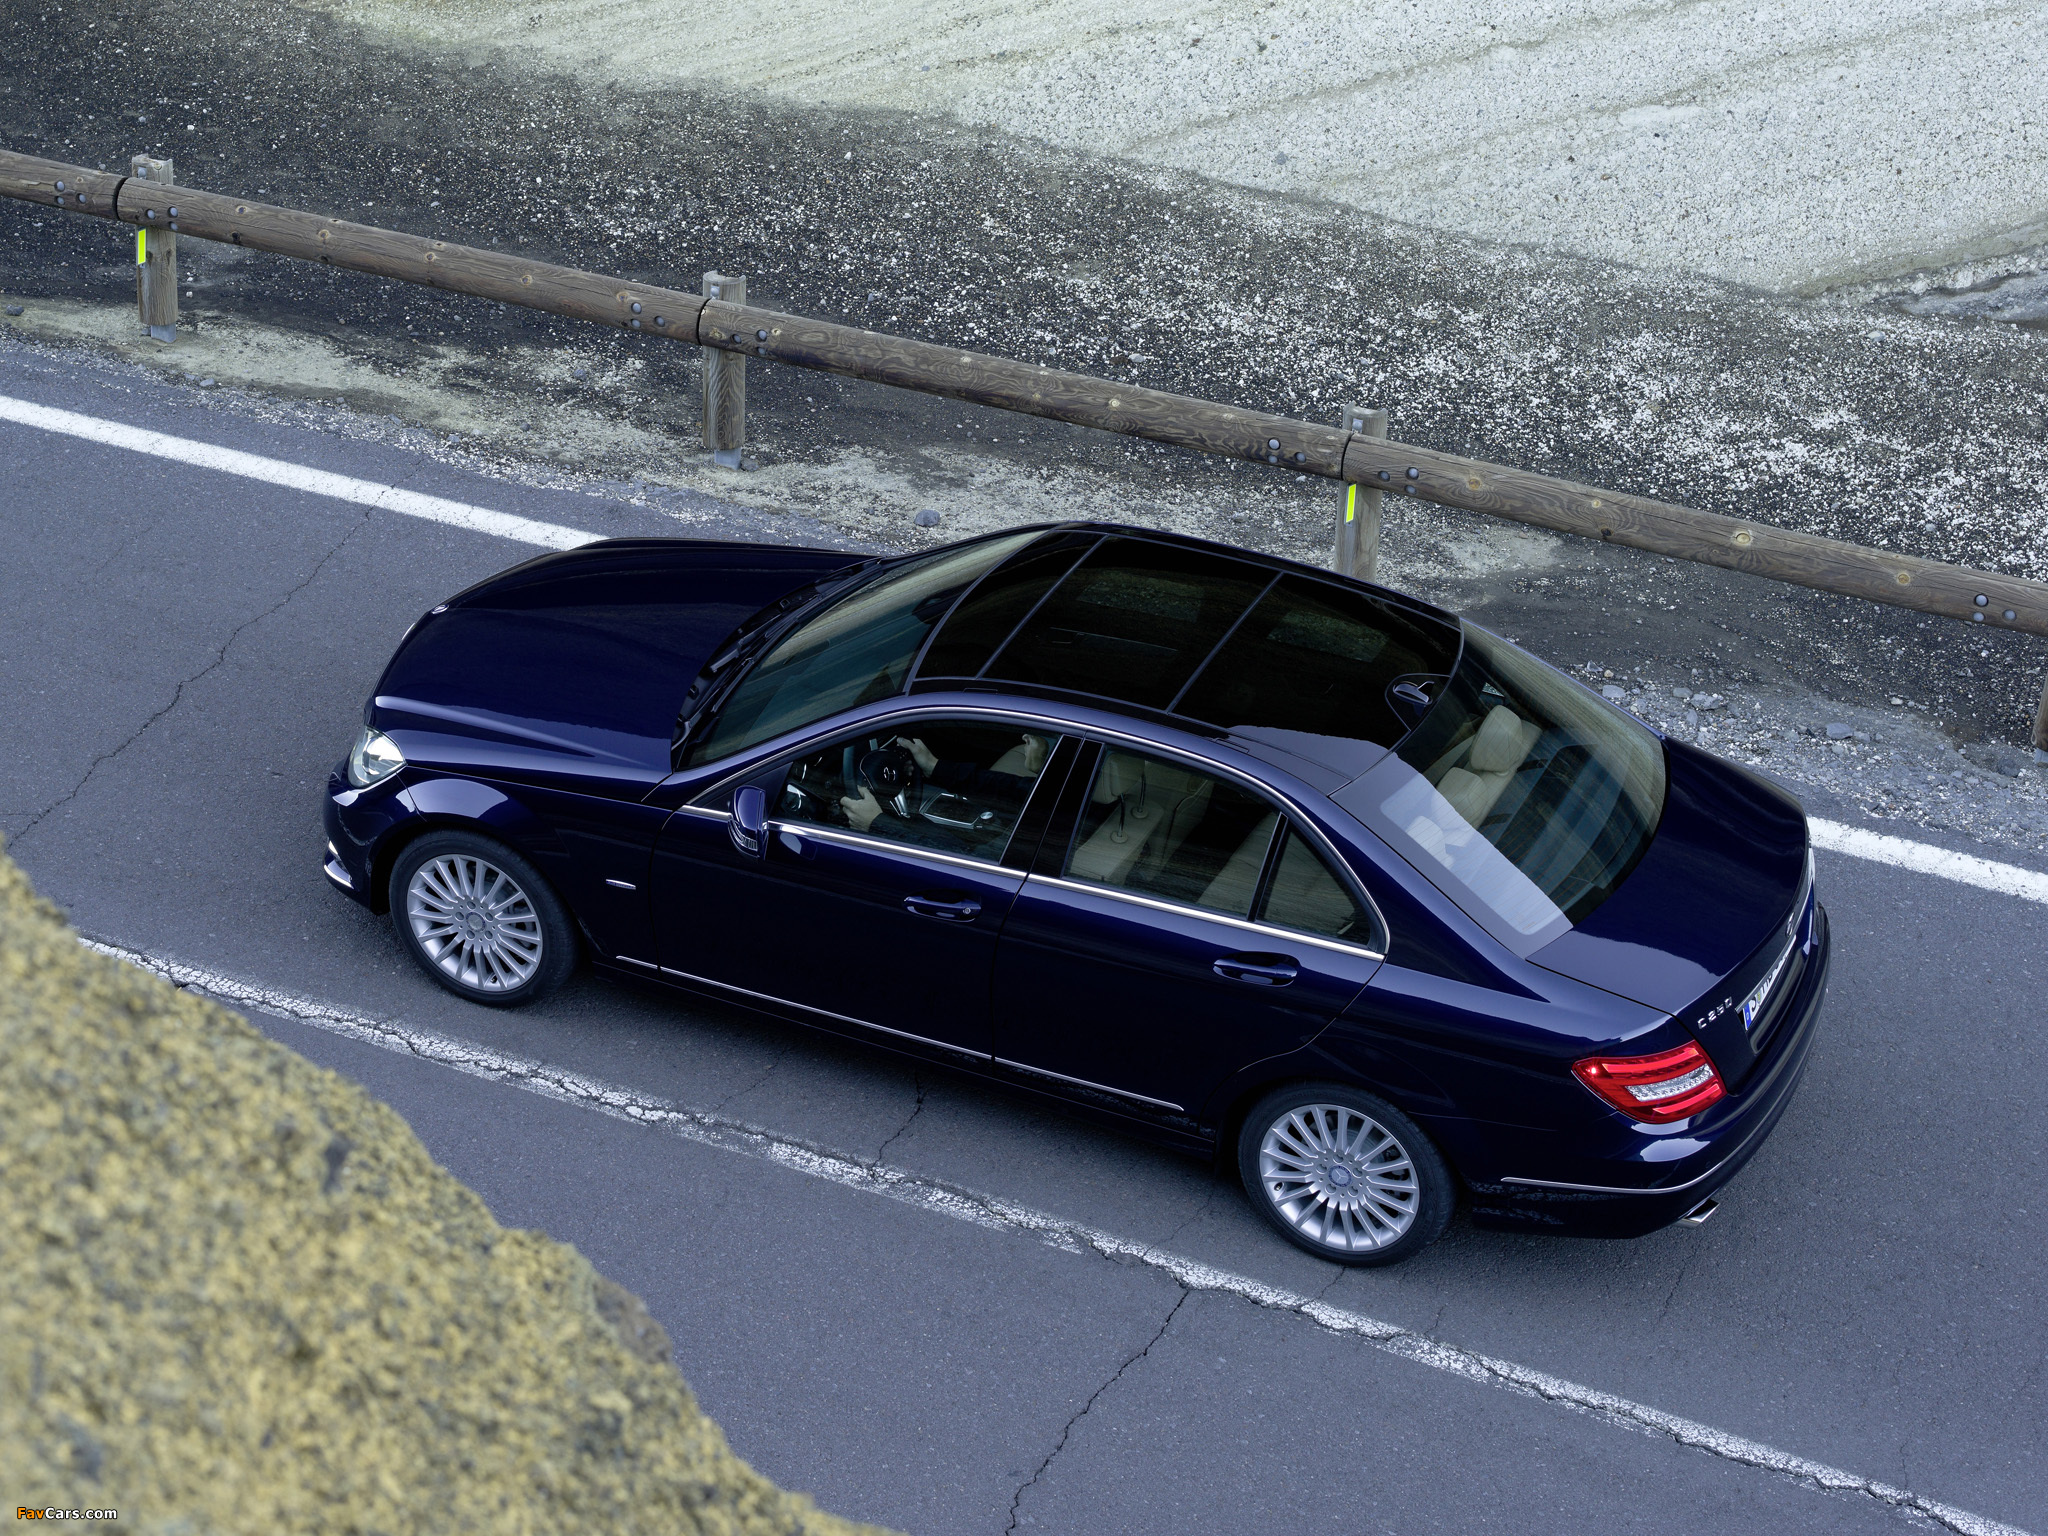 Mercedes-Benz C 250 CDI BlueEfficiency (W204) 2011 photos (2048 x 1536)